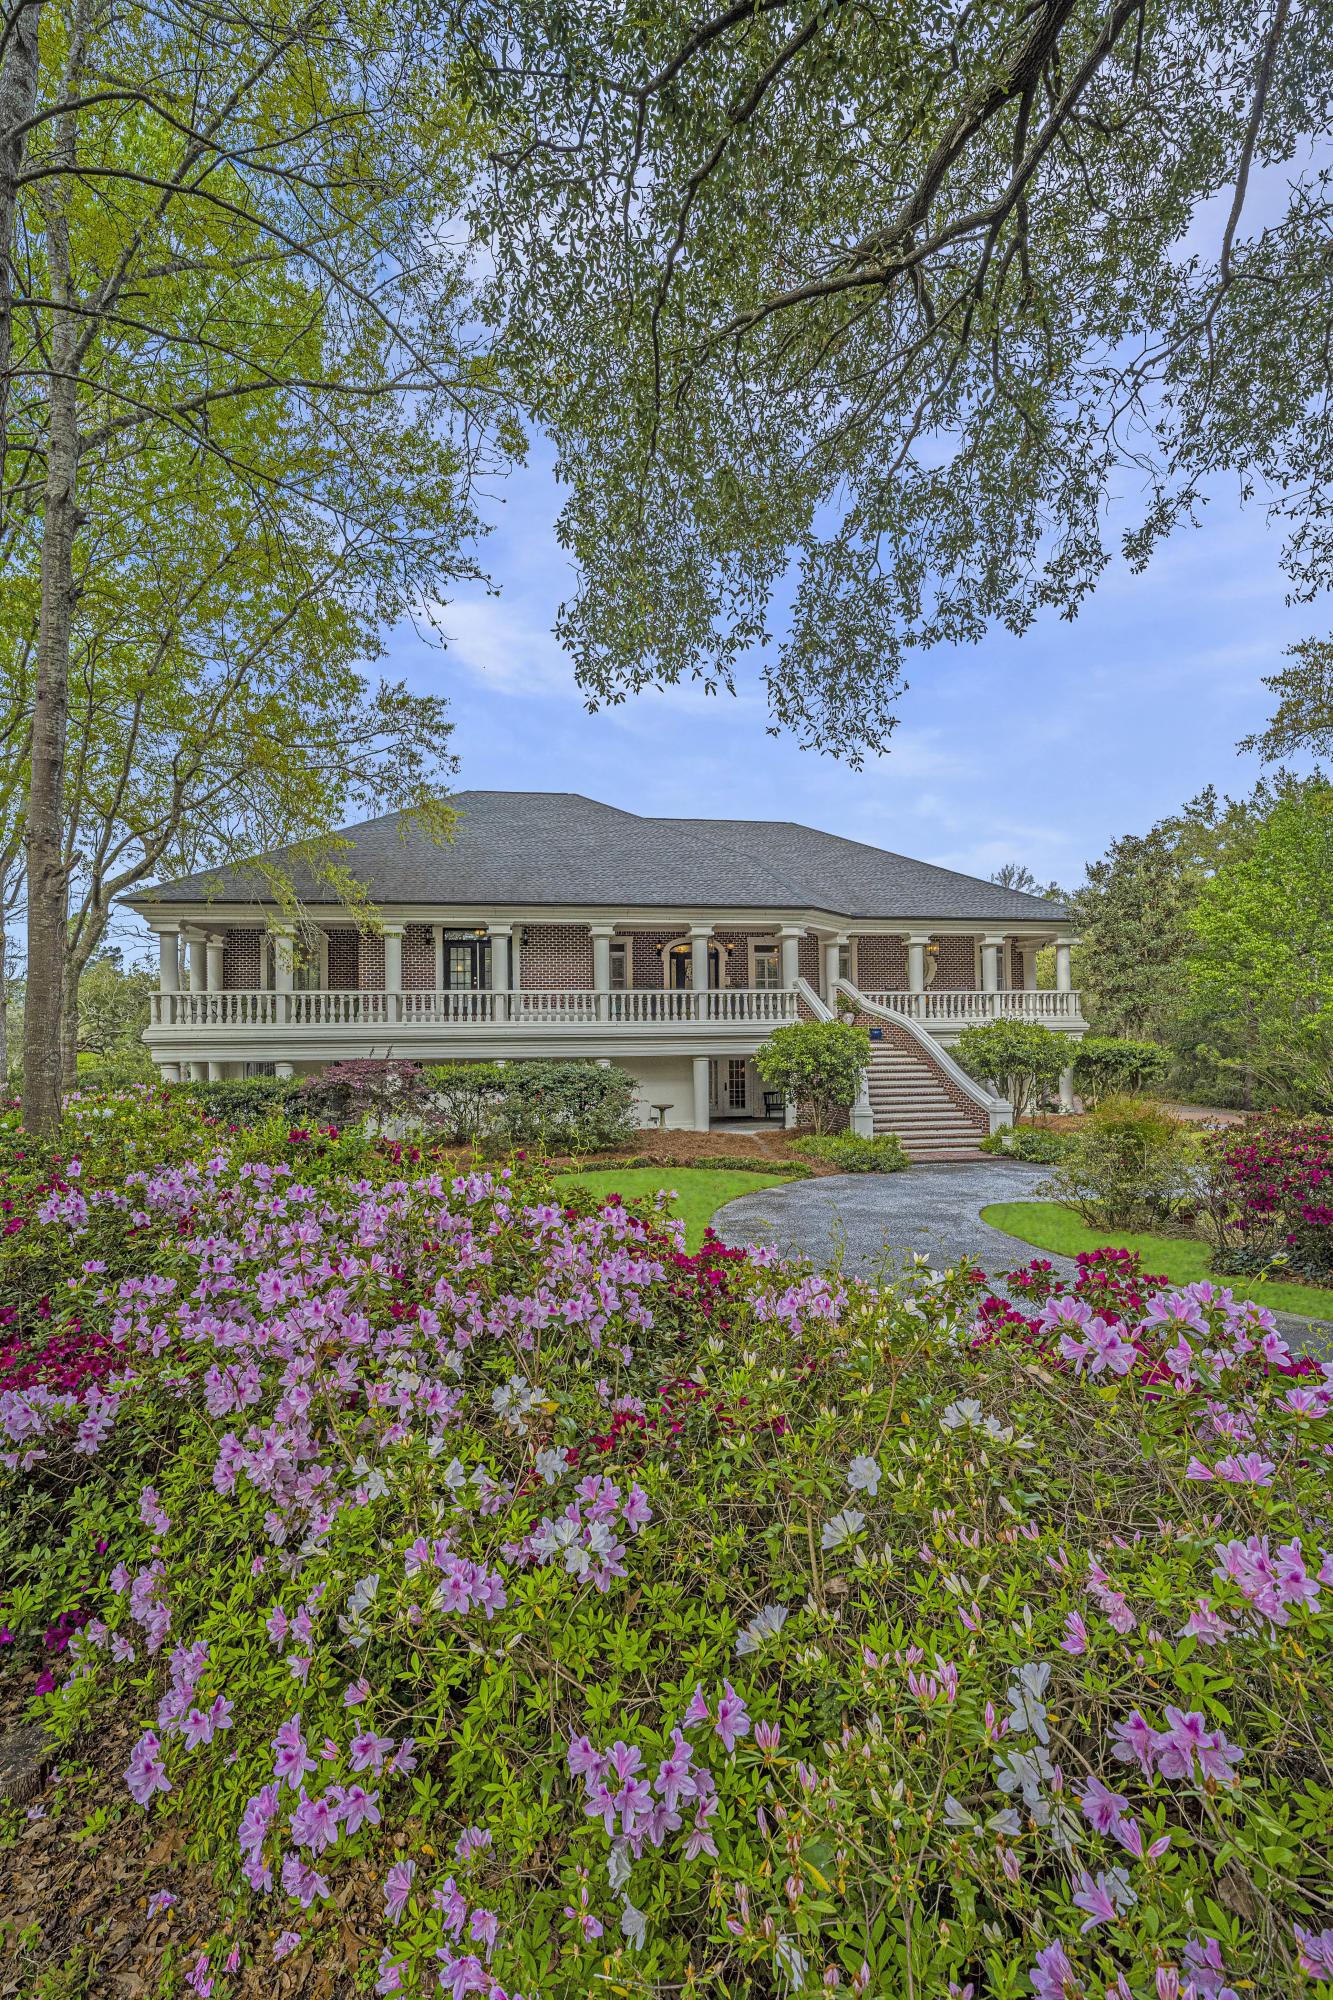 Cainhoy Landing Homes For Sale - 112 Cainhoy Landing, Charleston, SC - 41